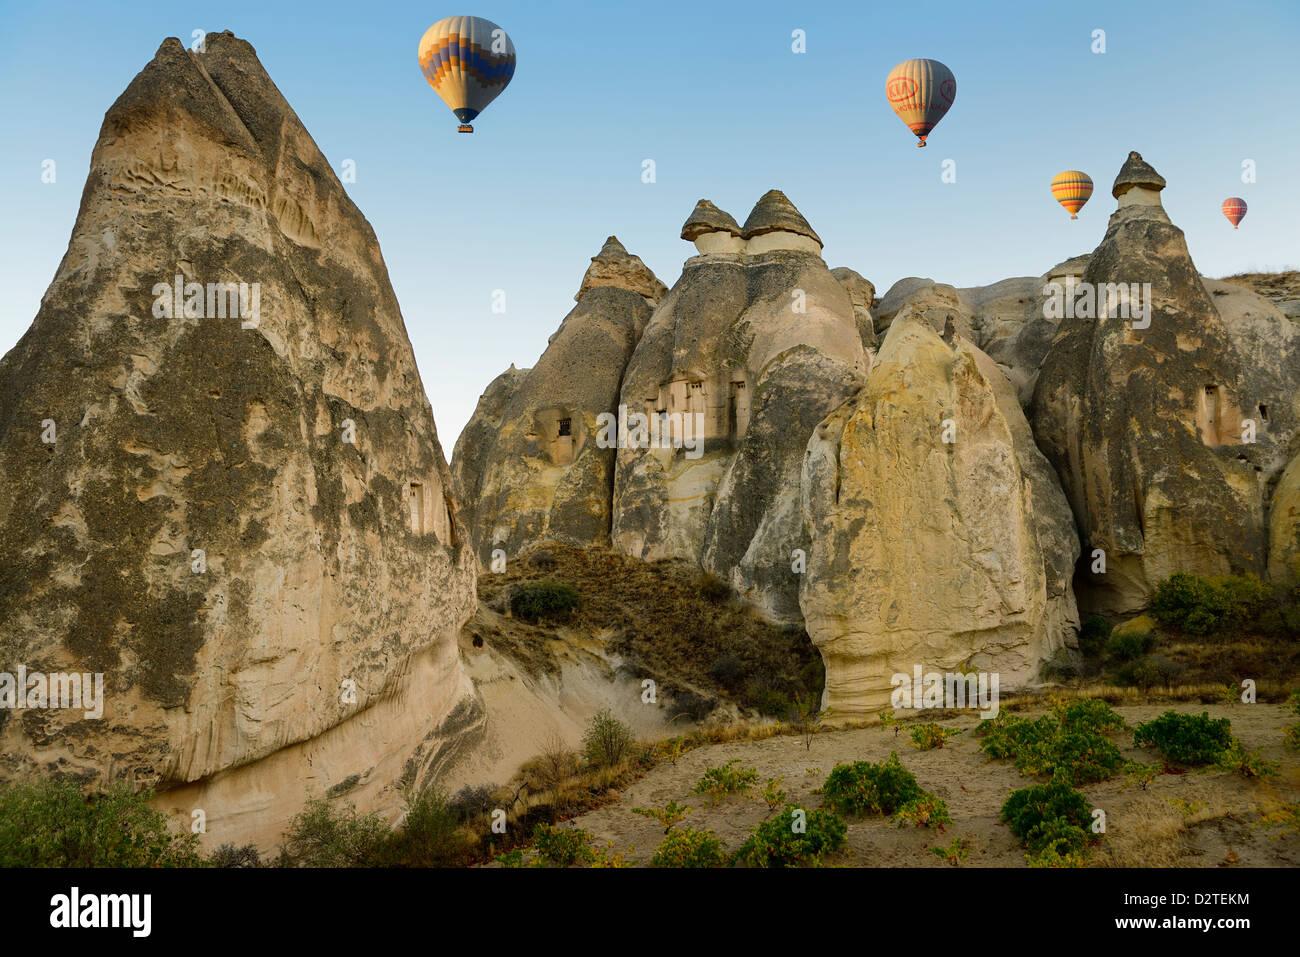 Maisons Troglodytes Dans Des Cheminees De Fees De Cappadoce Cavusin